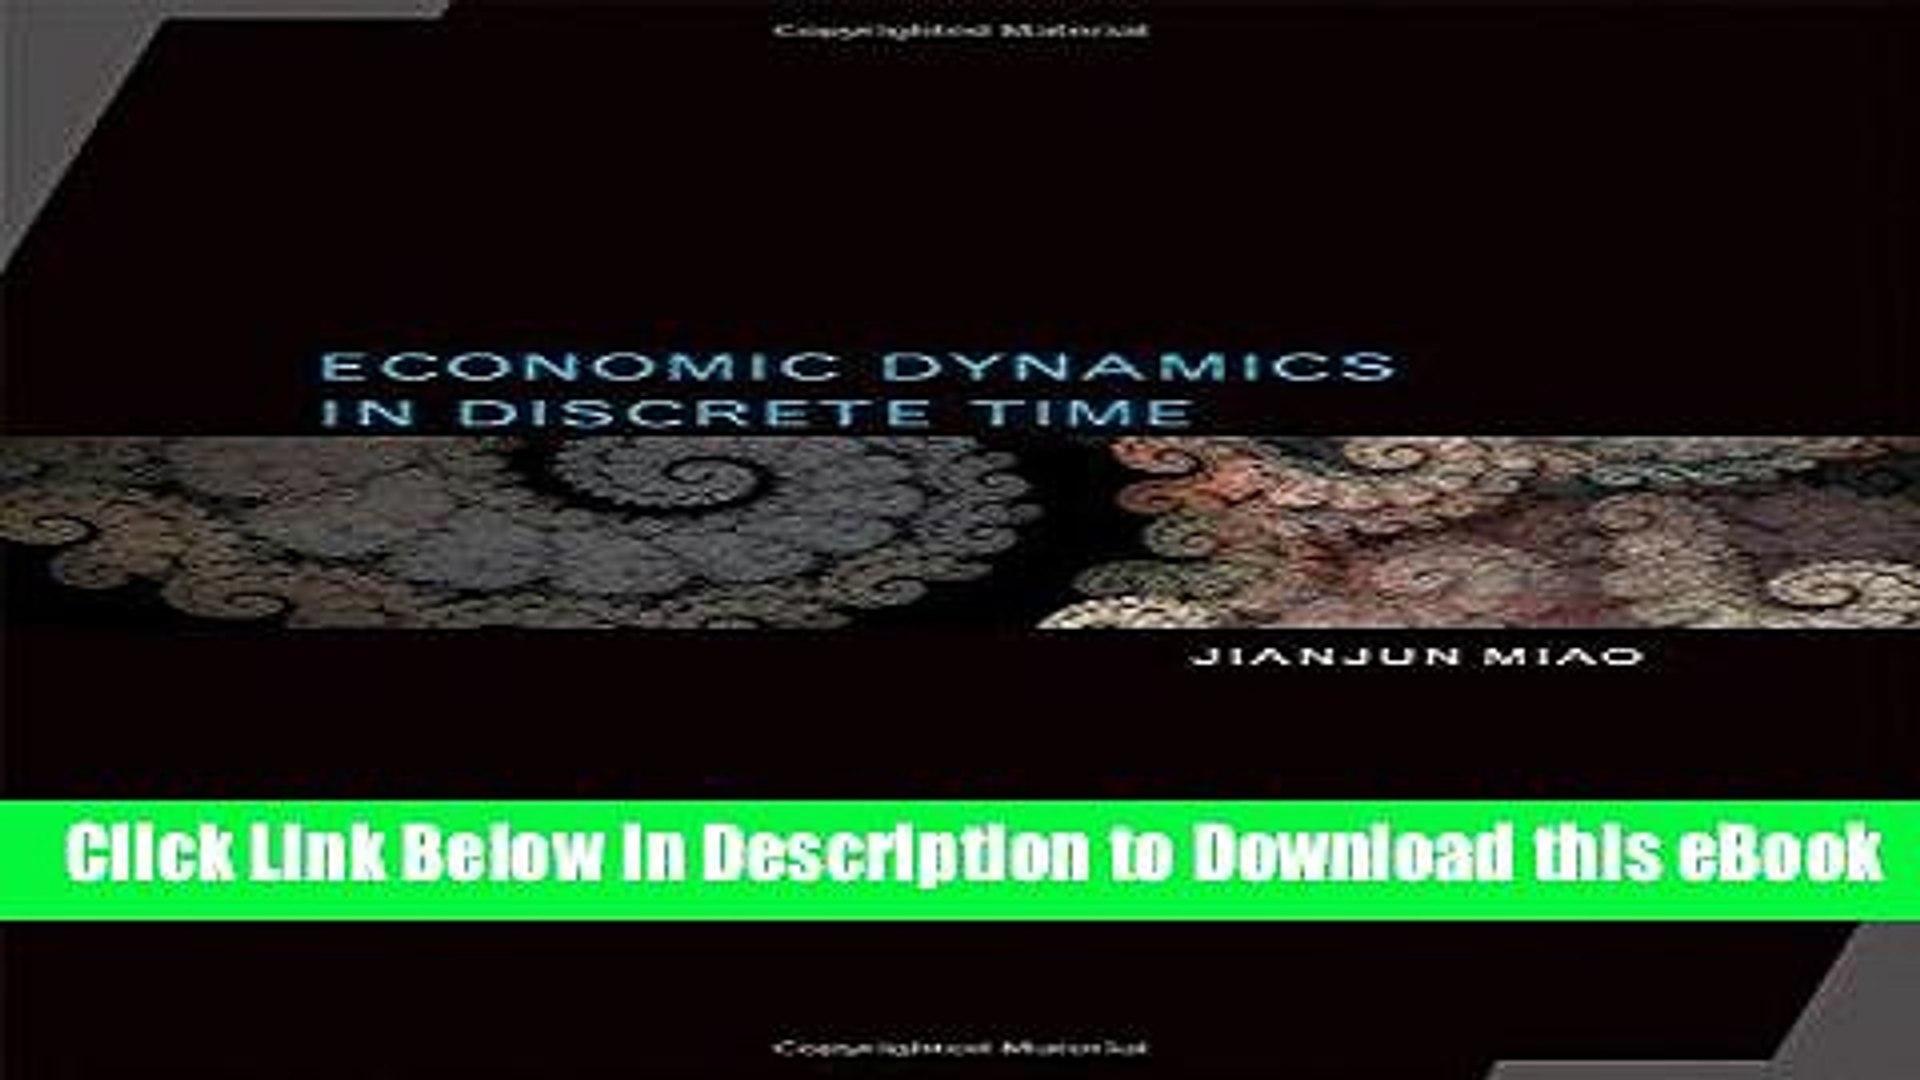 Economic Dynamics in Discrete Time